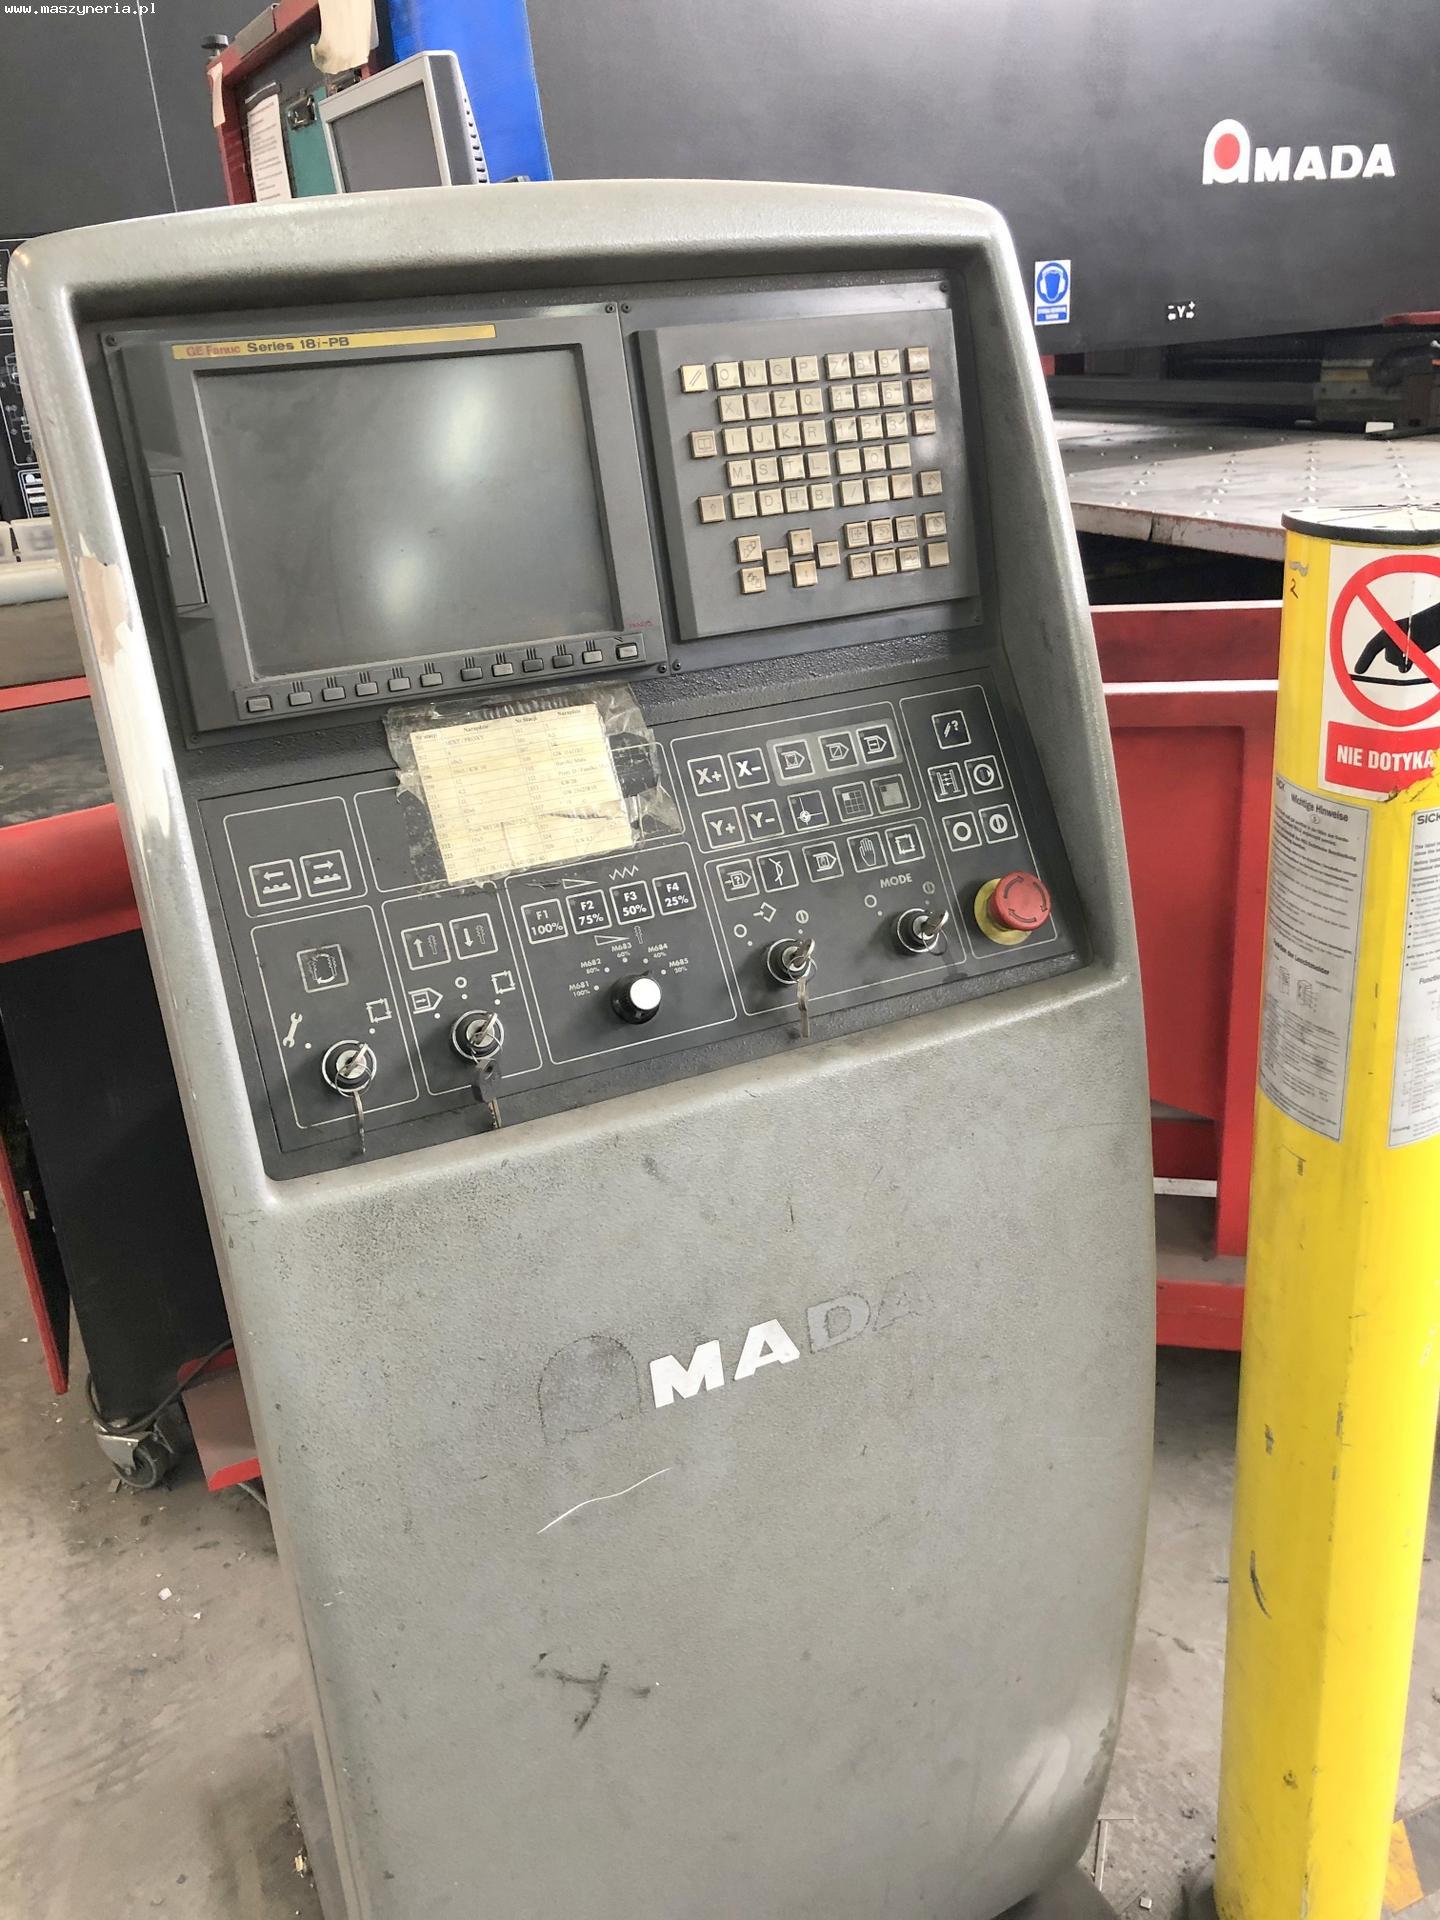 Punzonatrice a torretta AMADA EUROPE 258 in vendita - foto 5